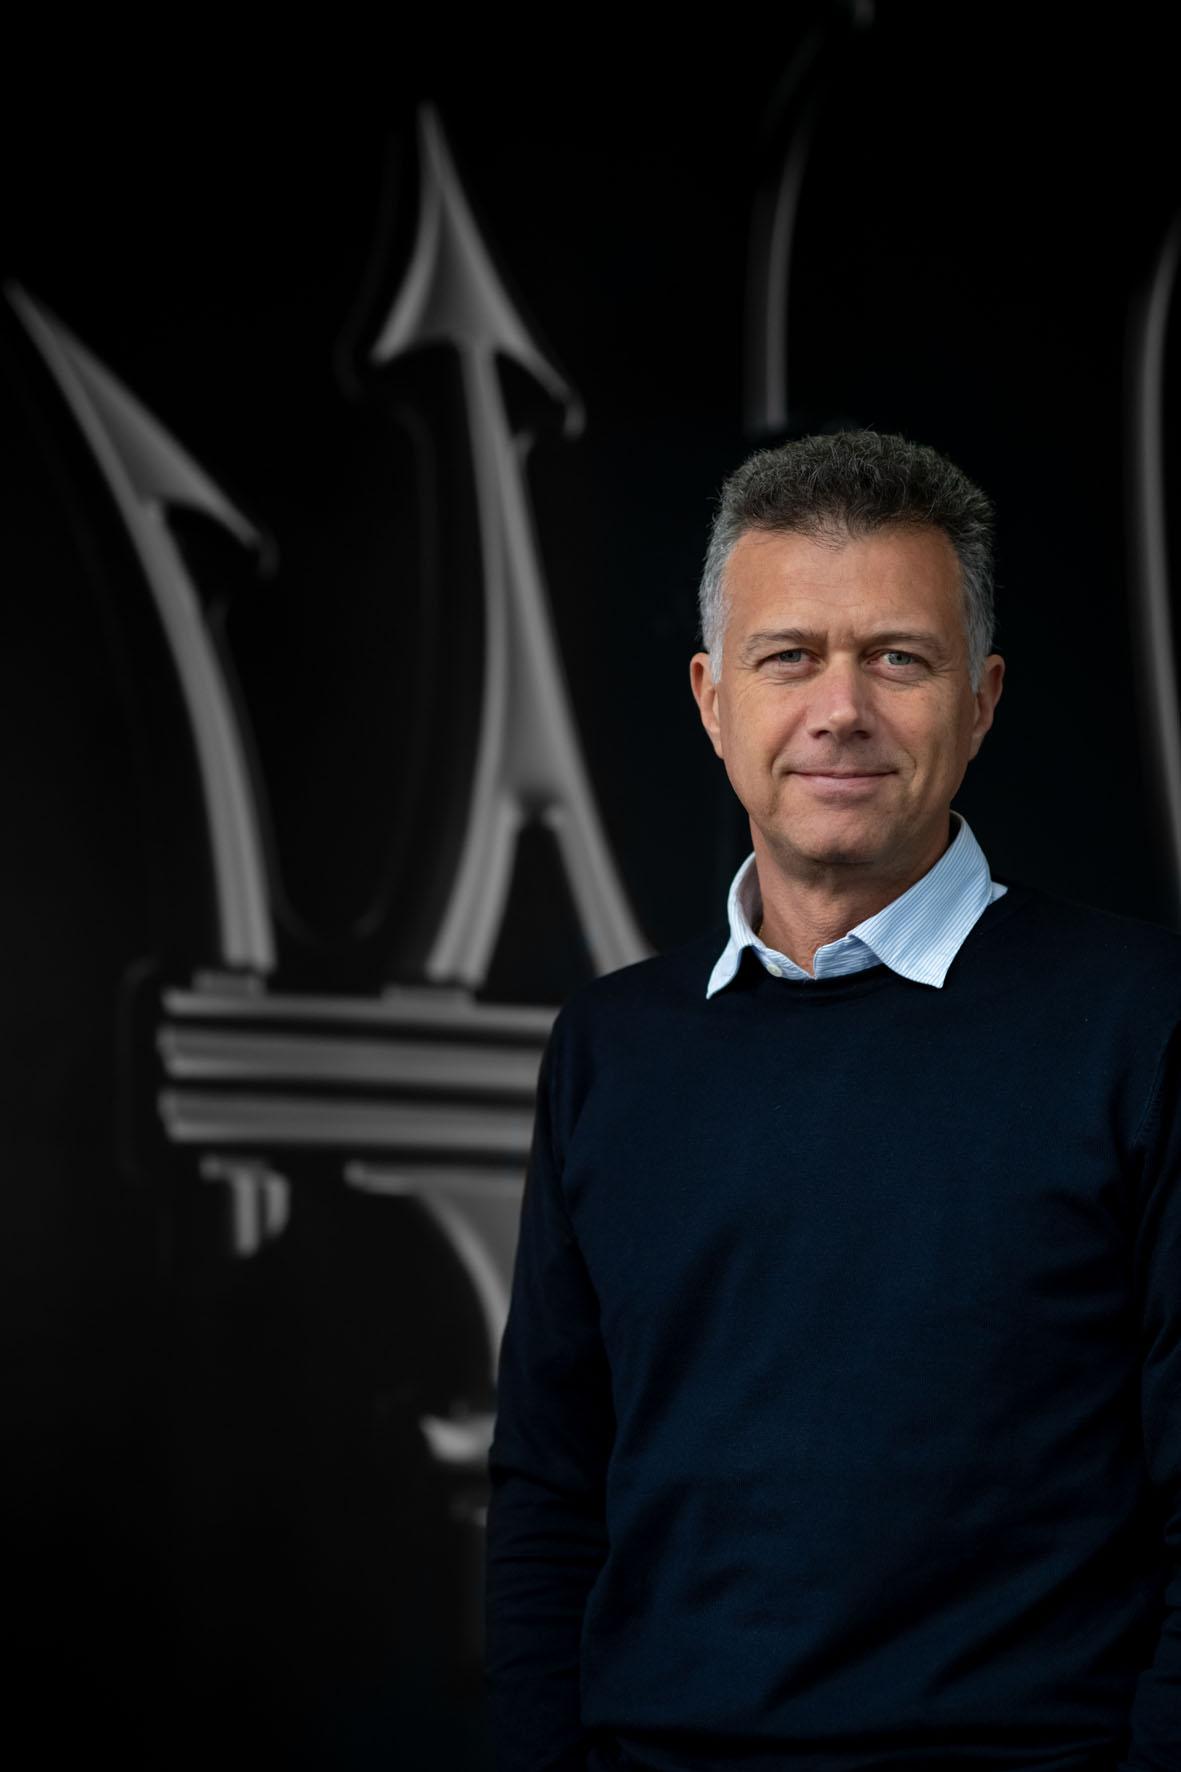 Maserati新世代計畫啟動全新領導團隊 迎接全新挑戰